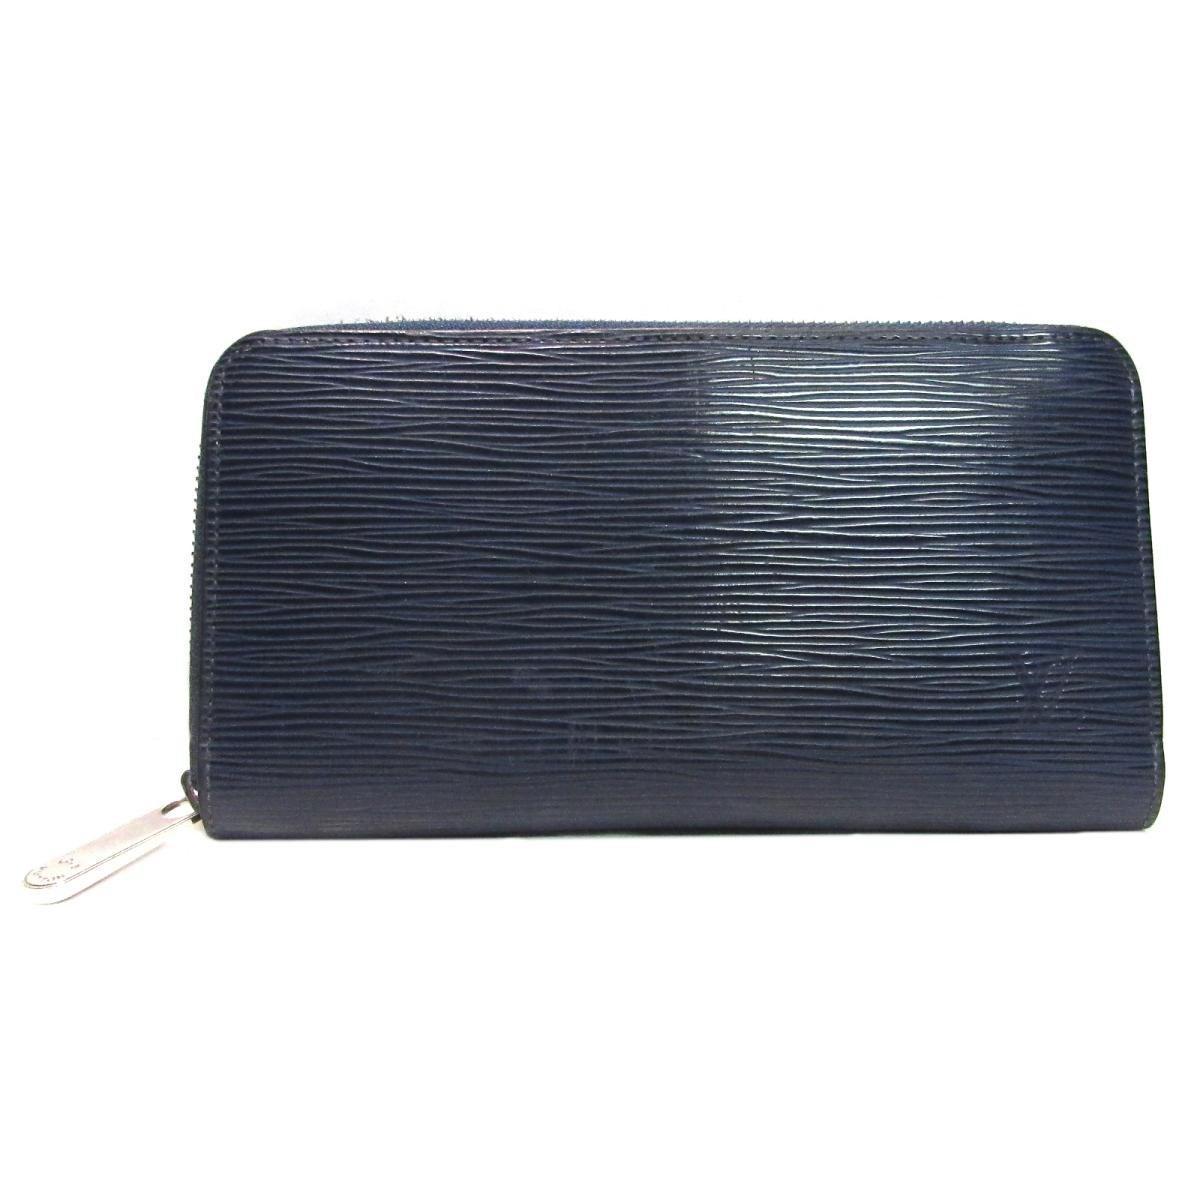 5c66abb5f88 Louis Vuitton Authentic Zippy Wallet M61873 Epi Leather Indigo Blue ...